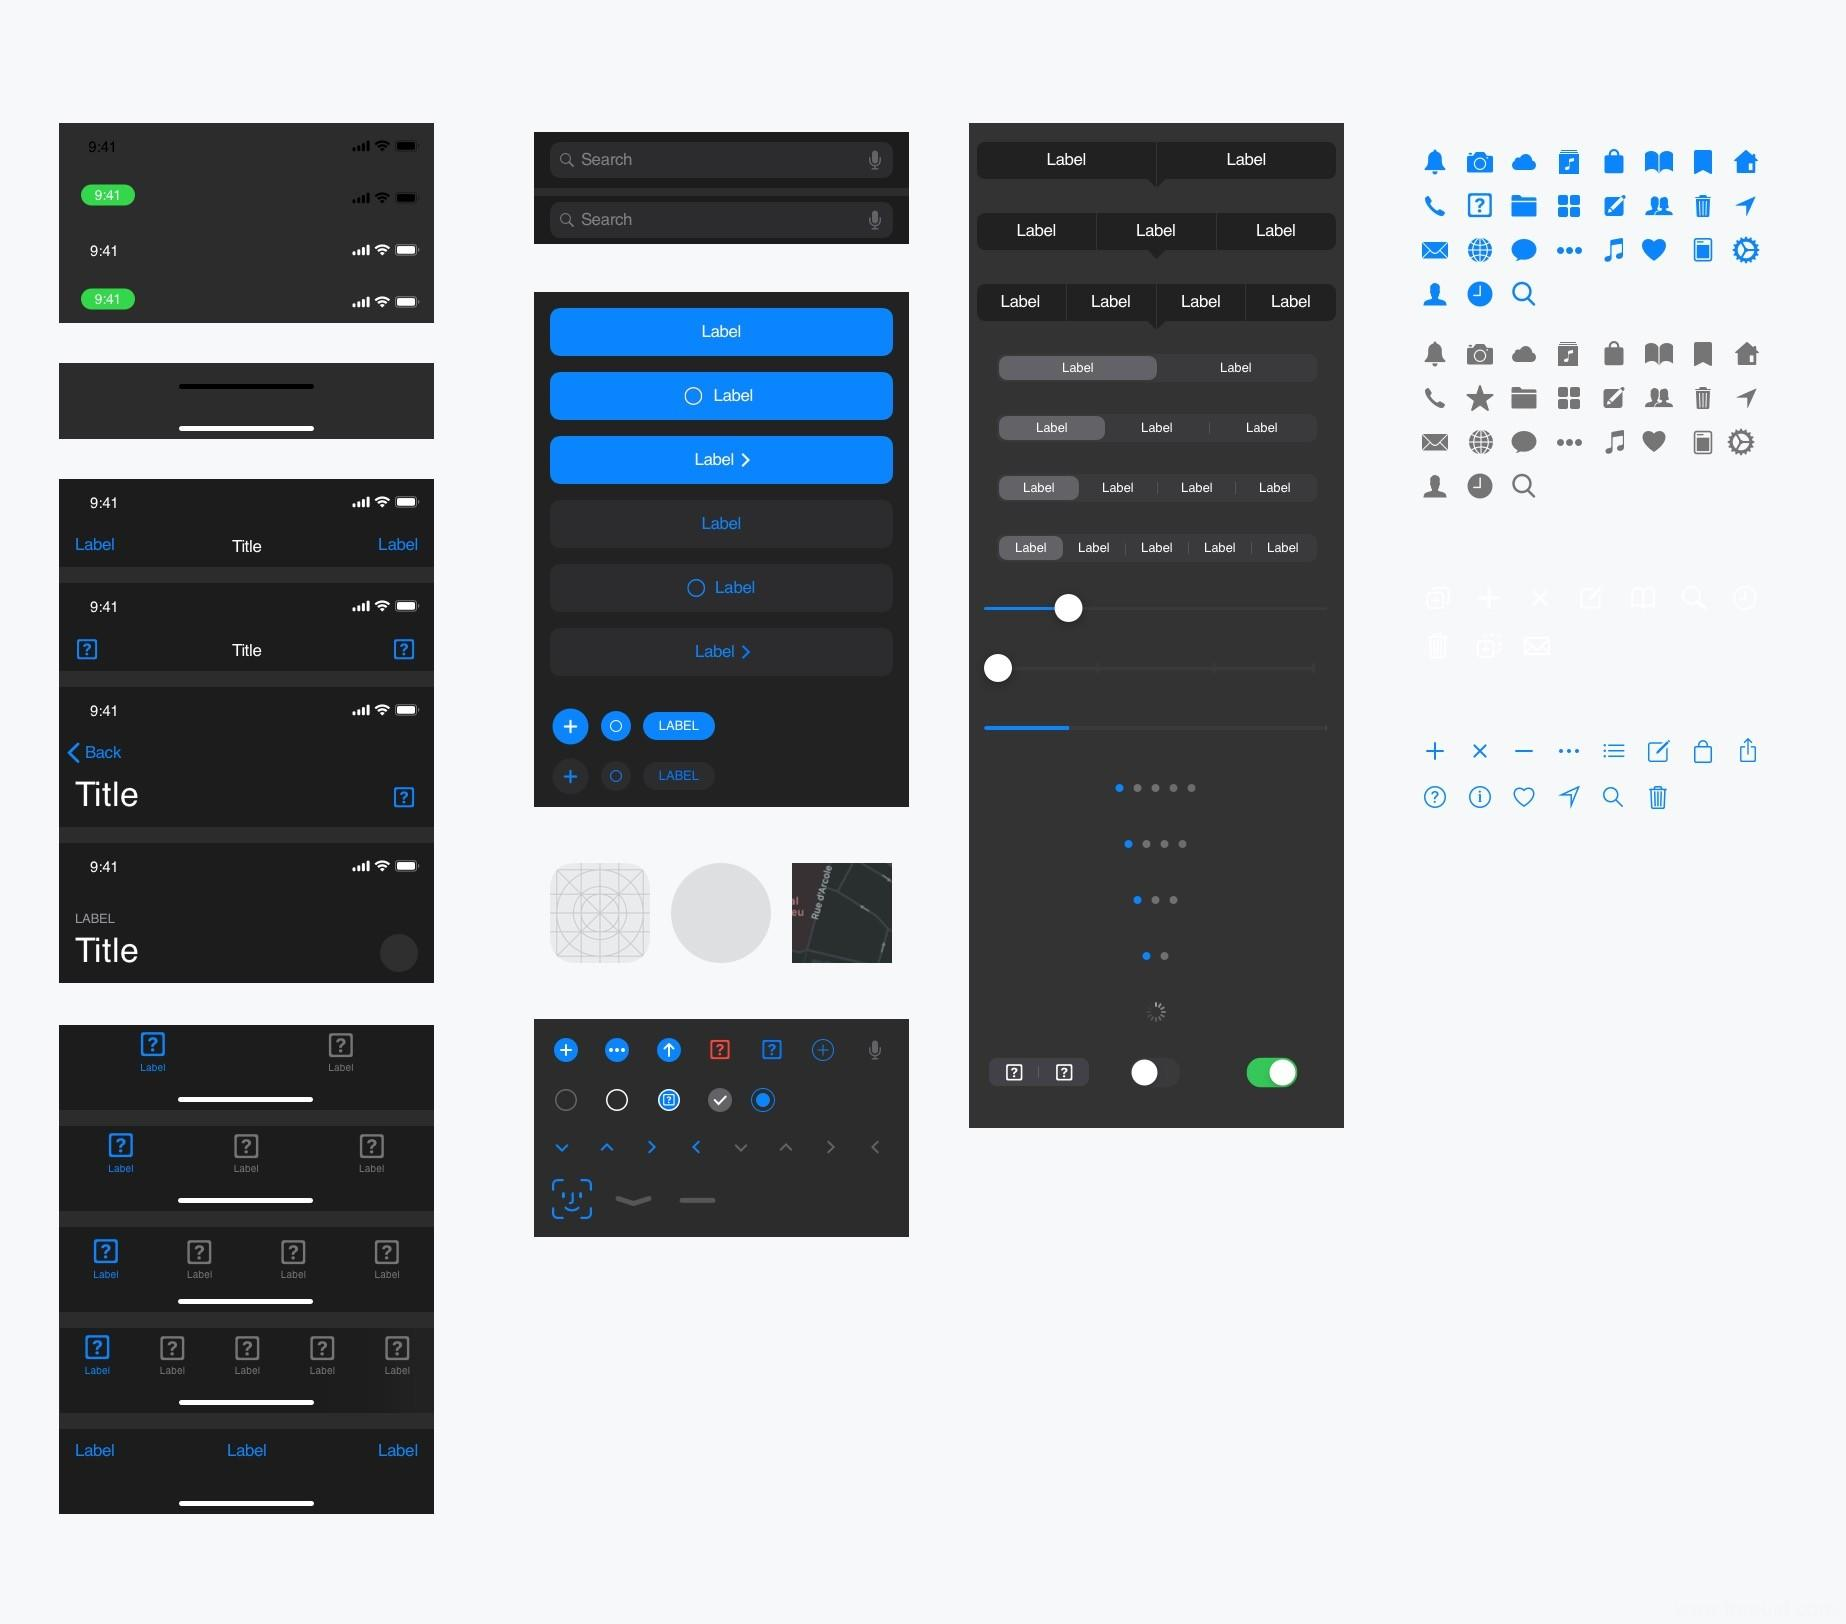 iOS13暗黑模式全套UI kit资源下载,iOS13 dark mode暗黑模式sketch源文件下载